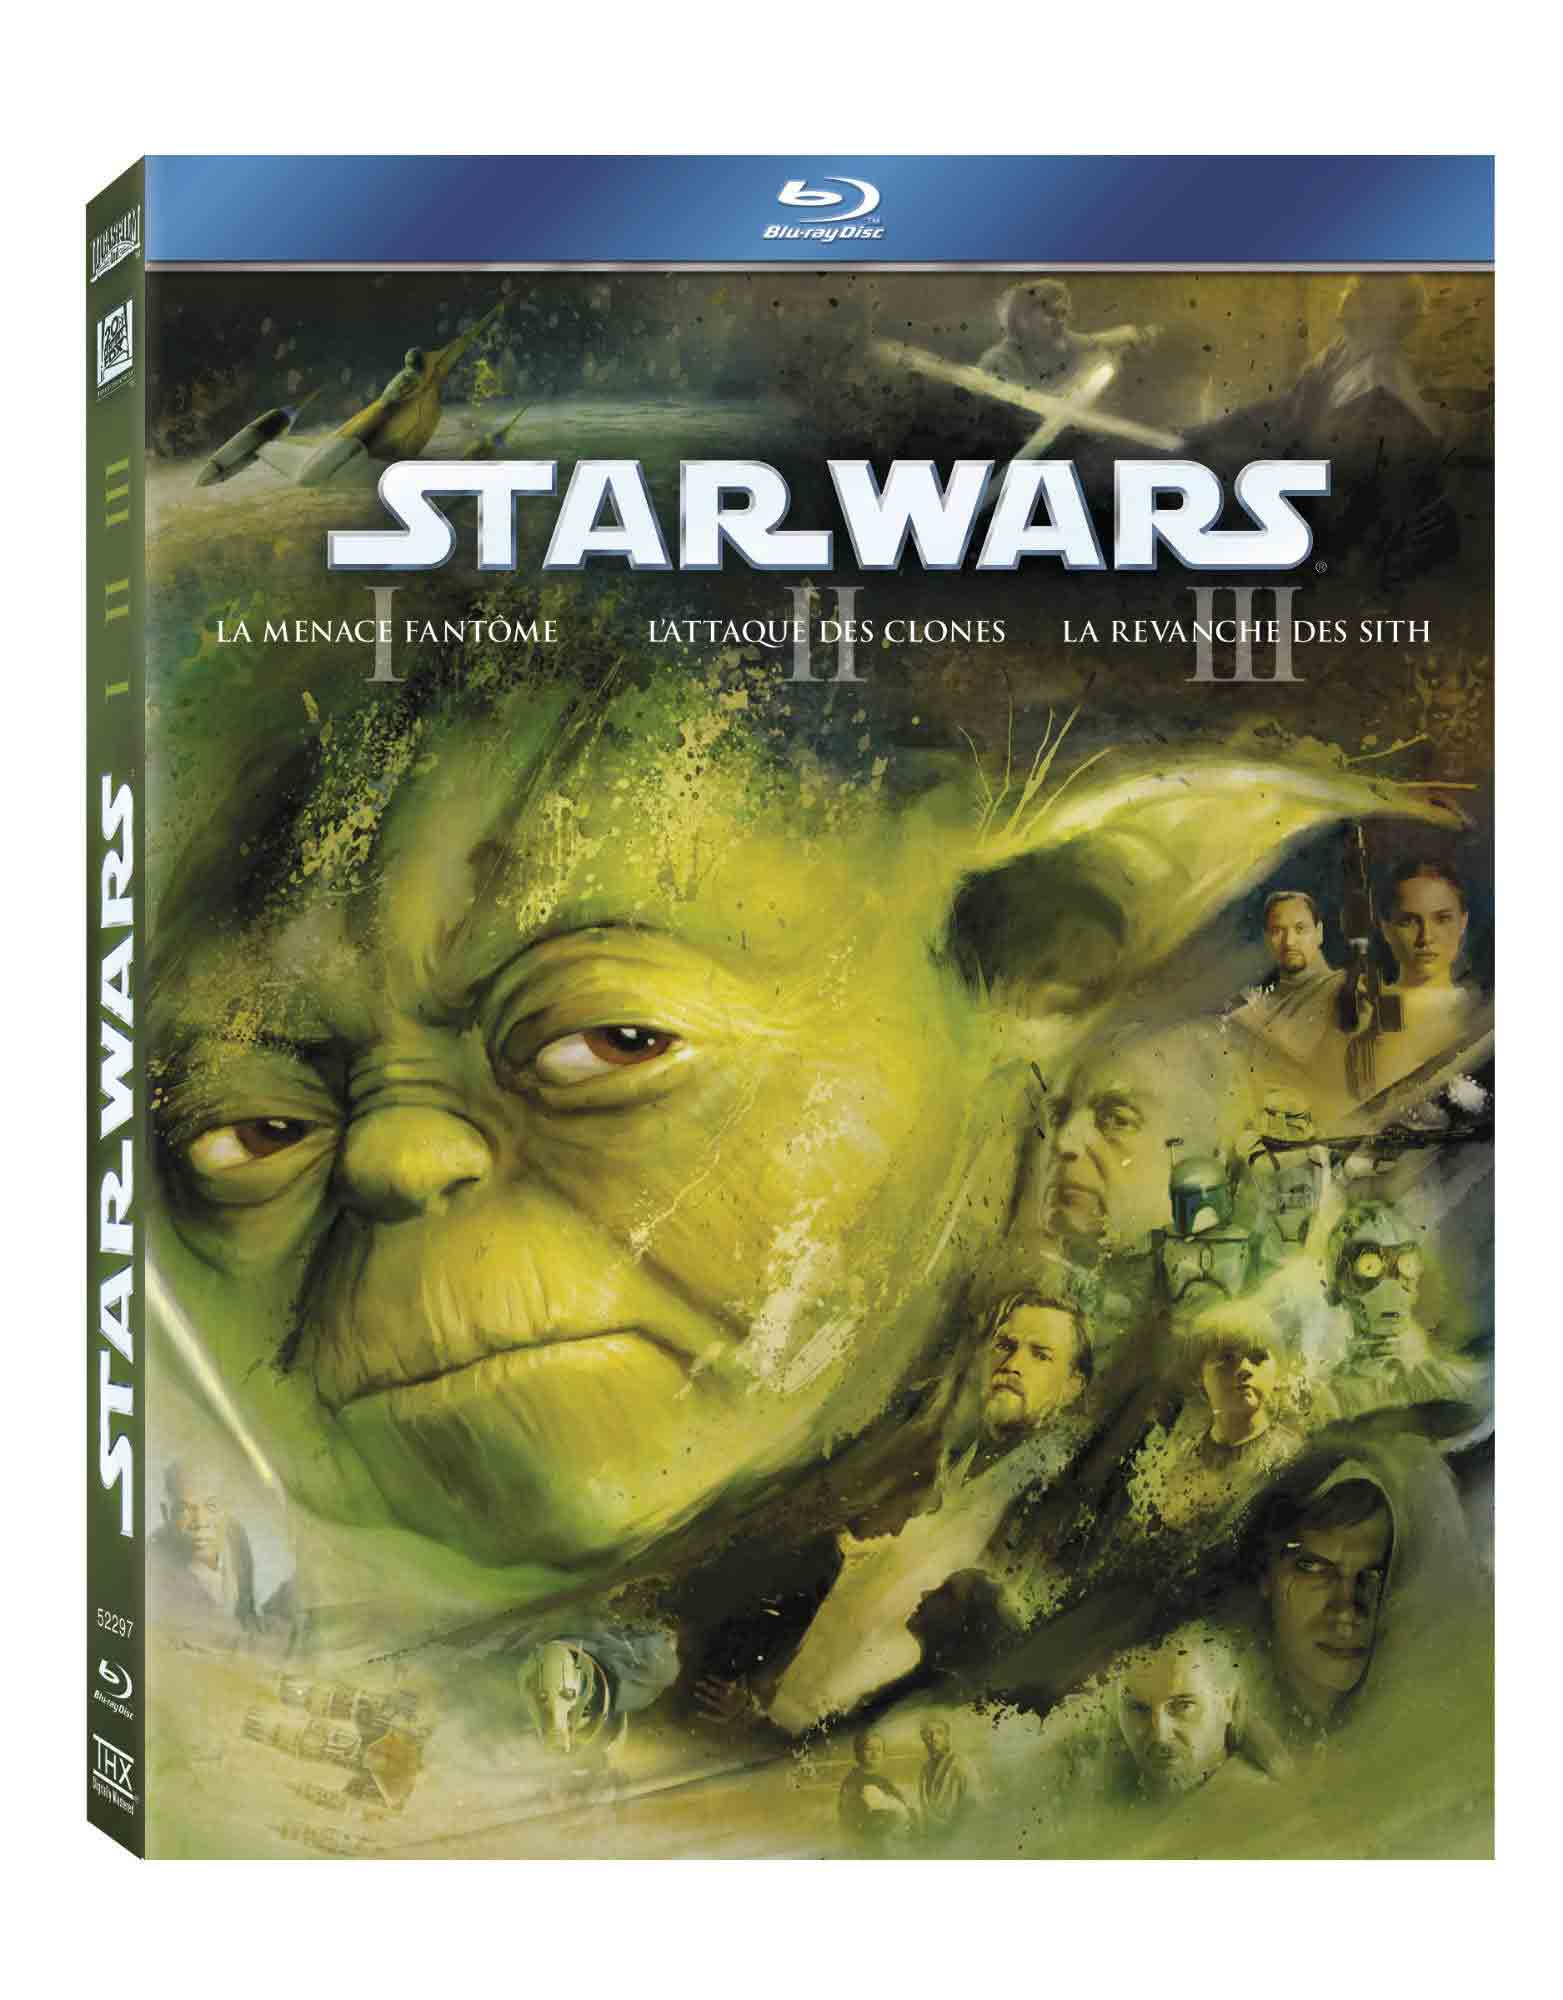 Star Wars : coffrets Blu-ray [Lucasfilm - 2011] - Page 5 19732386